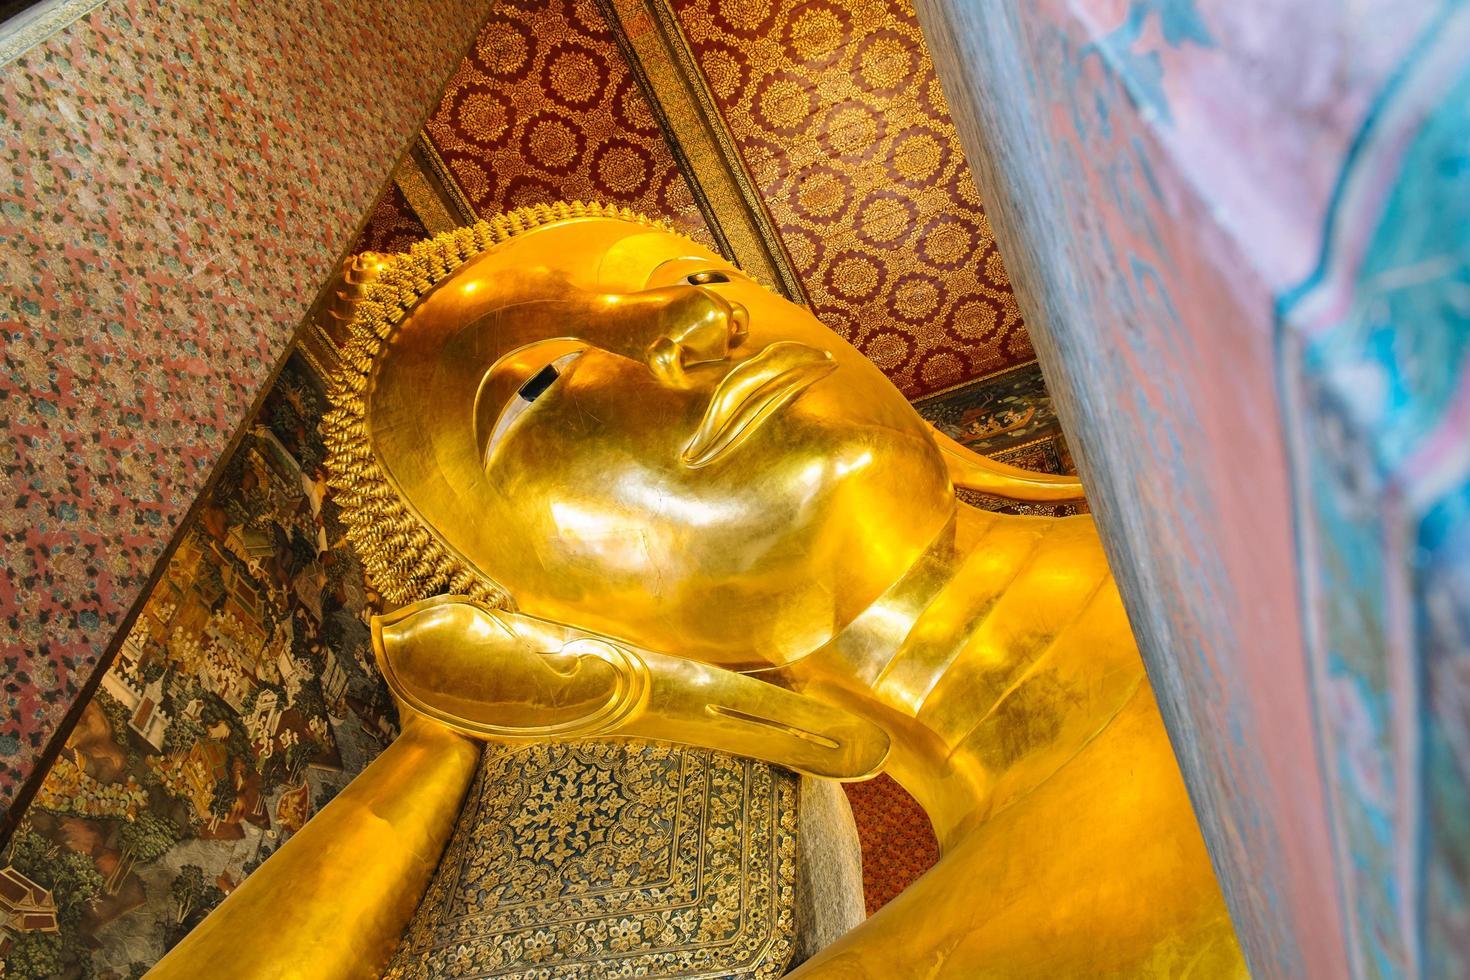 riesige goldene liegende Buddha-Statue foto